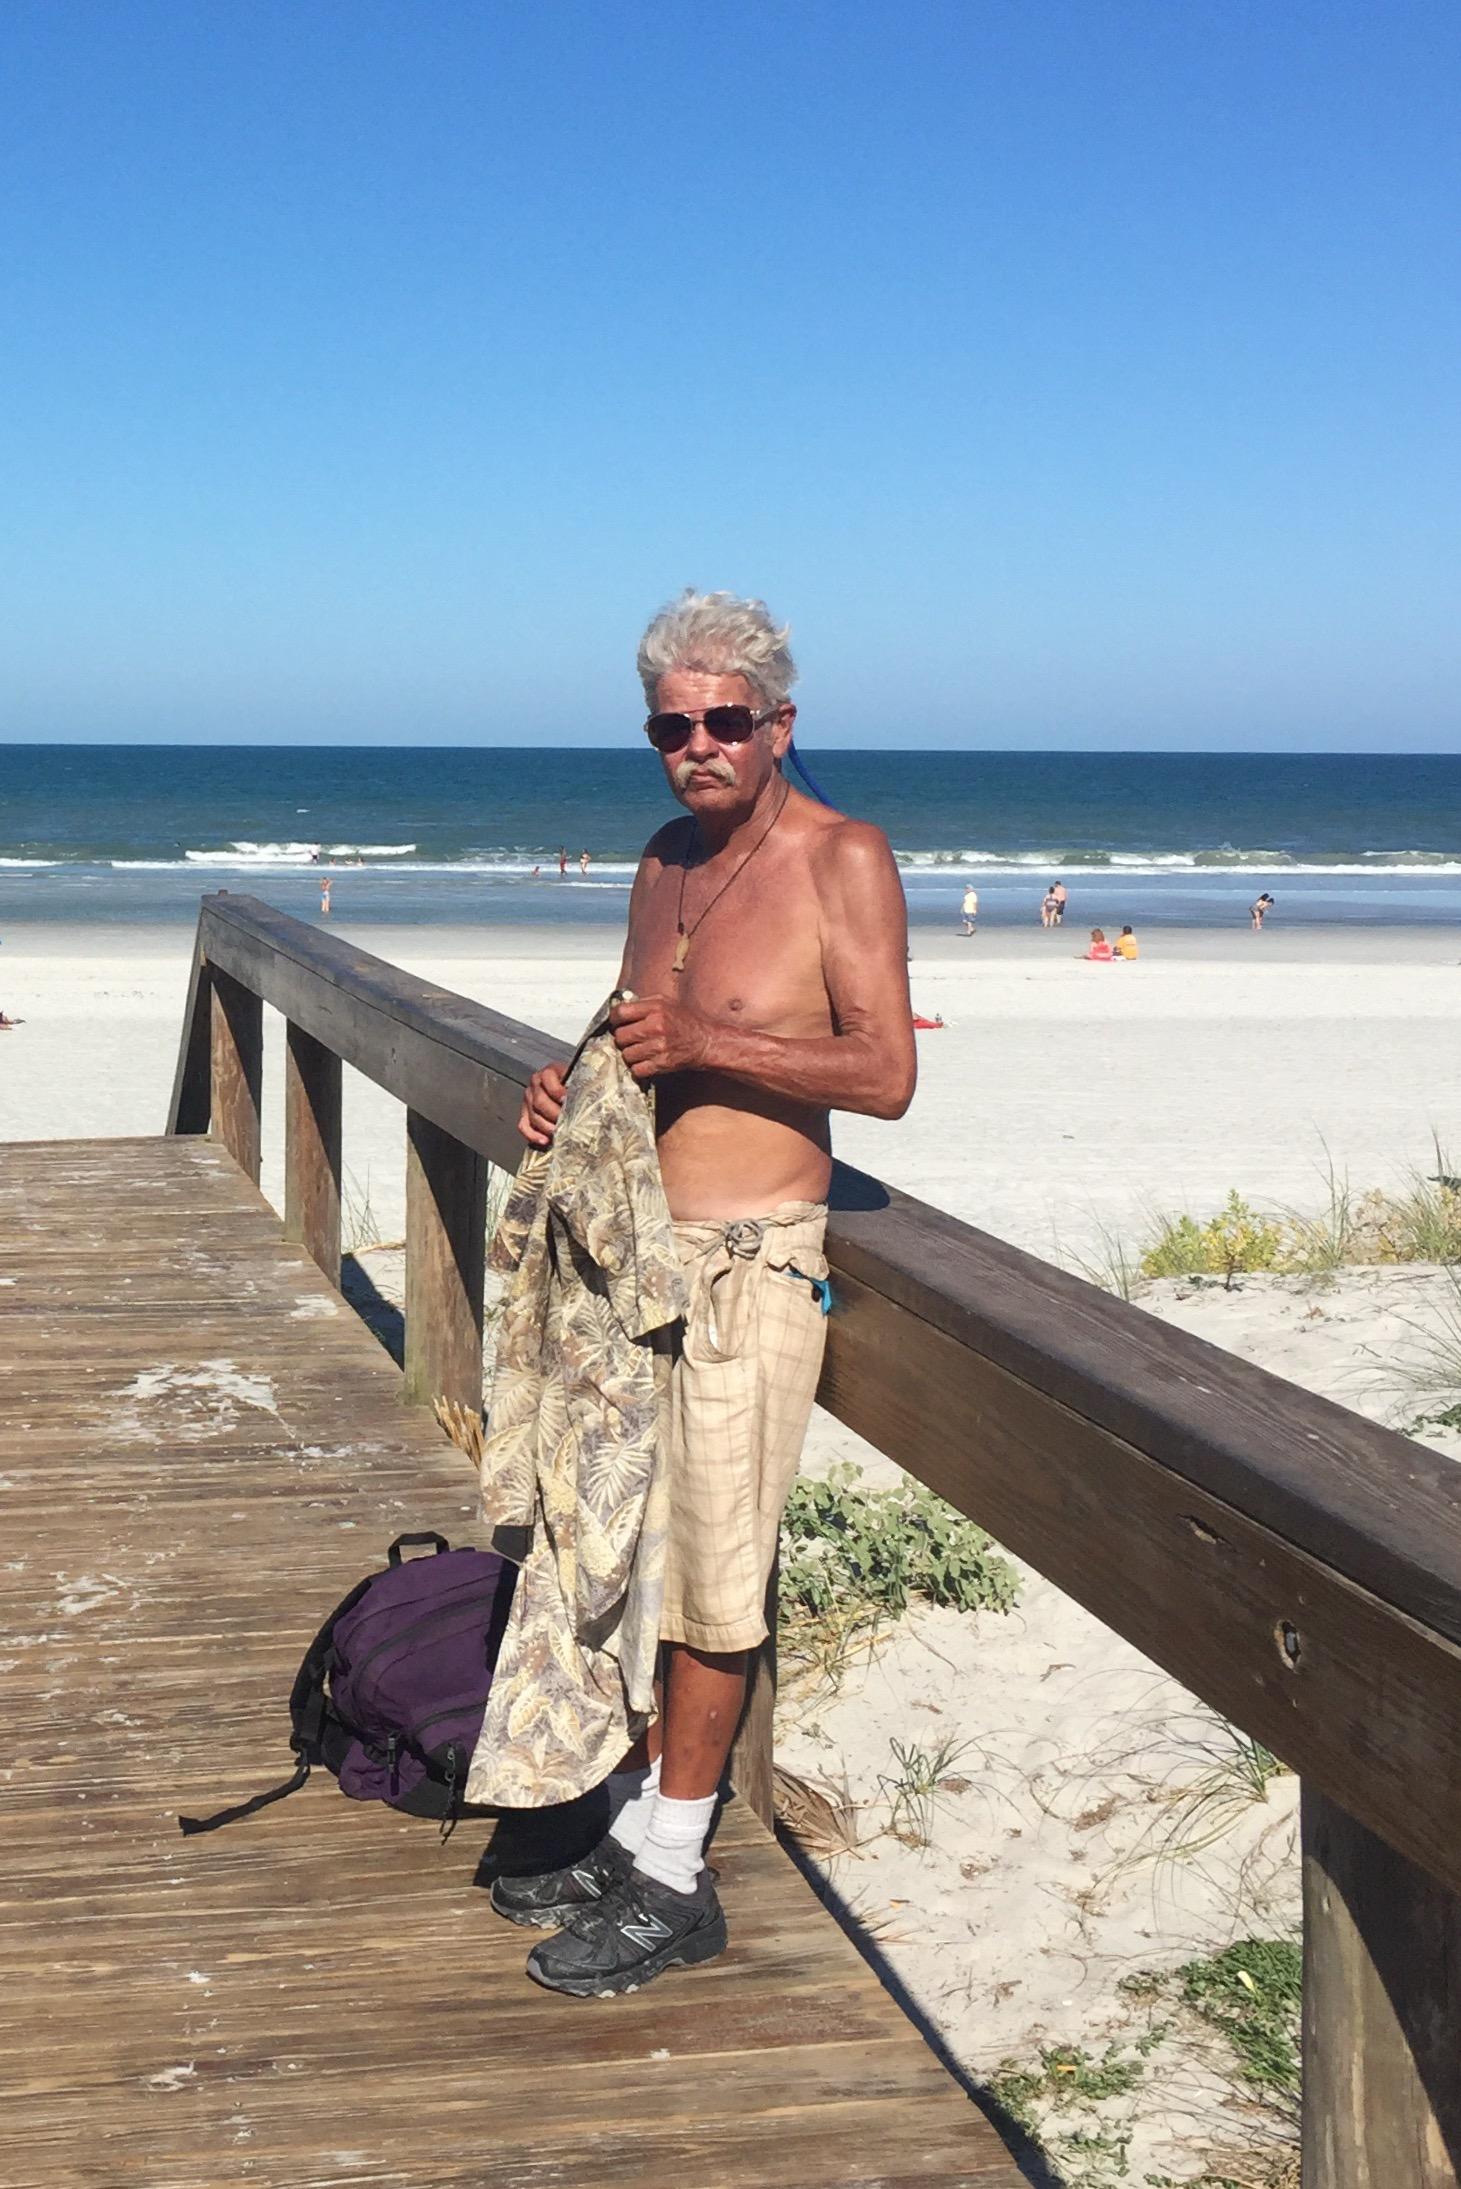 jax beach bro